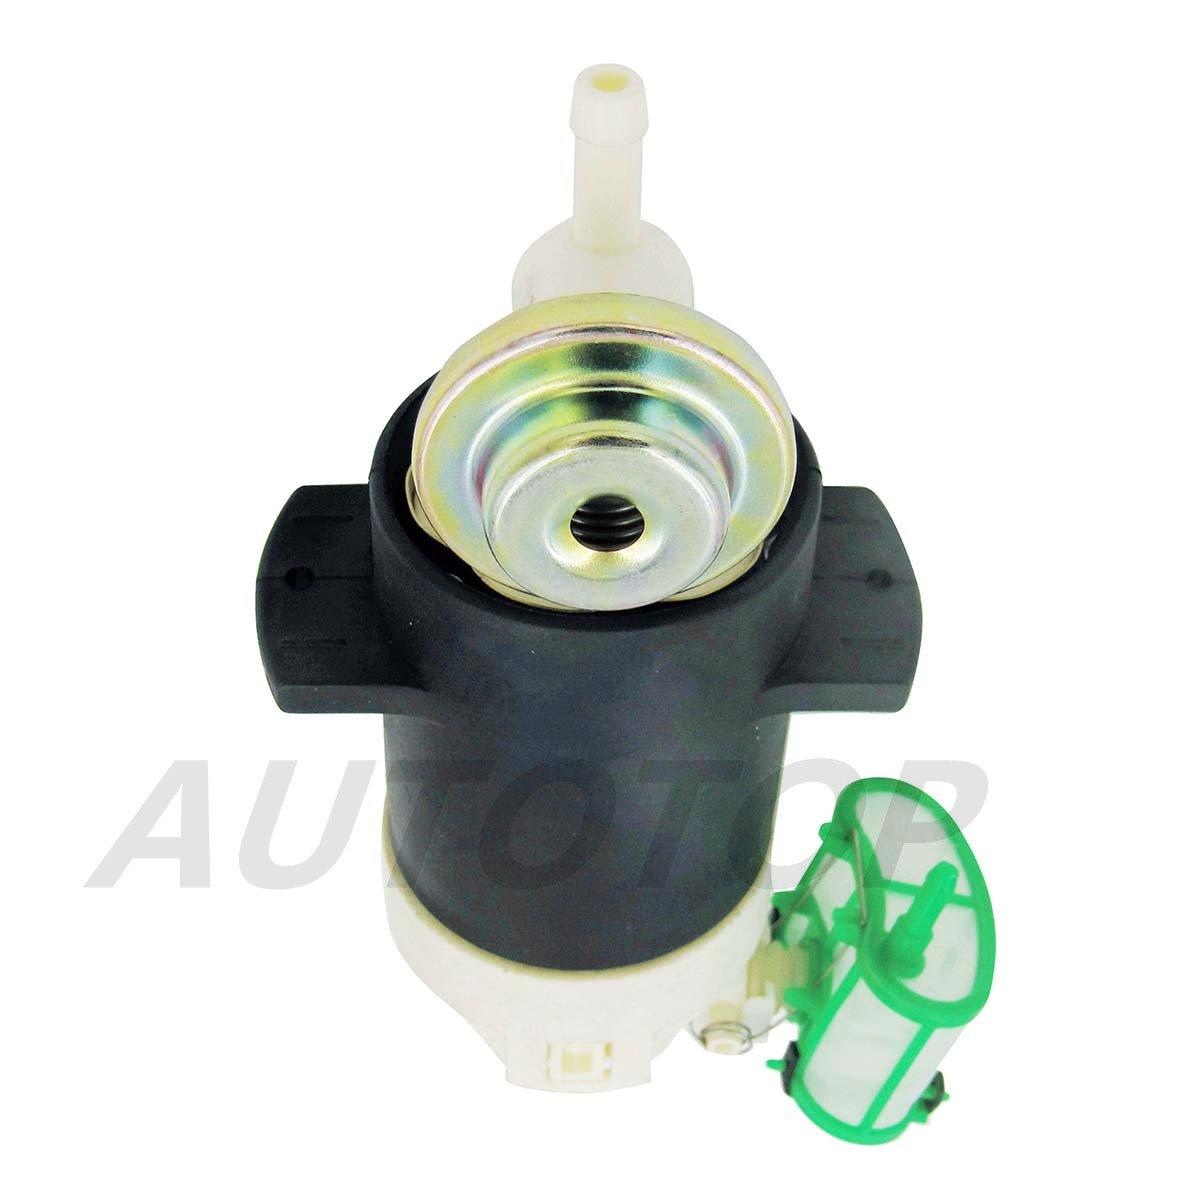 Autotop New Electric Intank Fuel Pump Fit 86 94 Nissan 1988 D21 Pickup Filter 95 96 E8376 1705001g08 1704059g24 1704059g15 Automotive